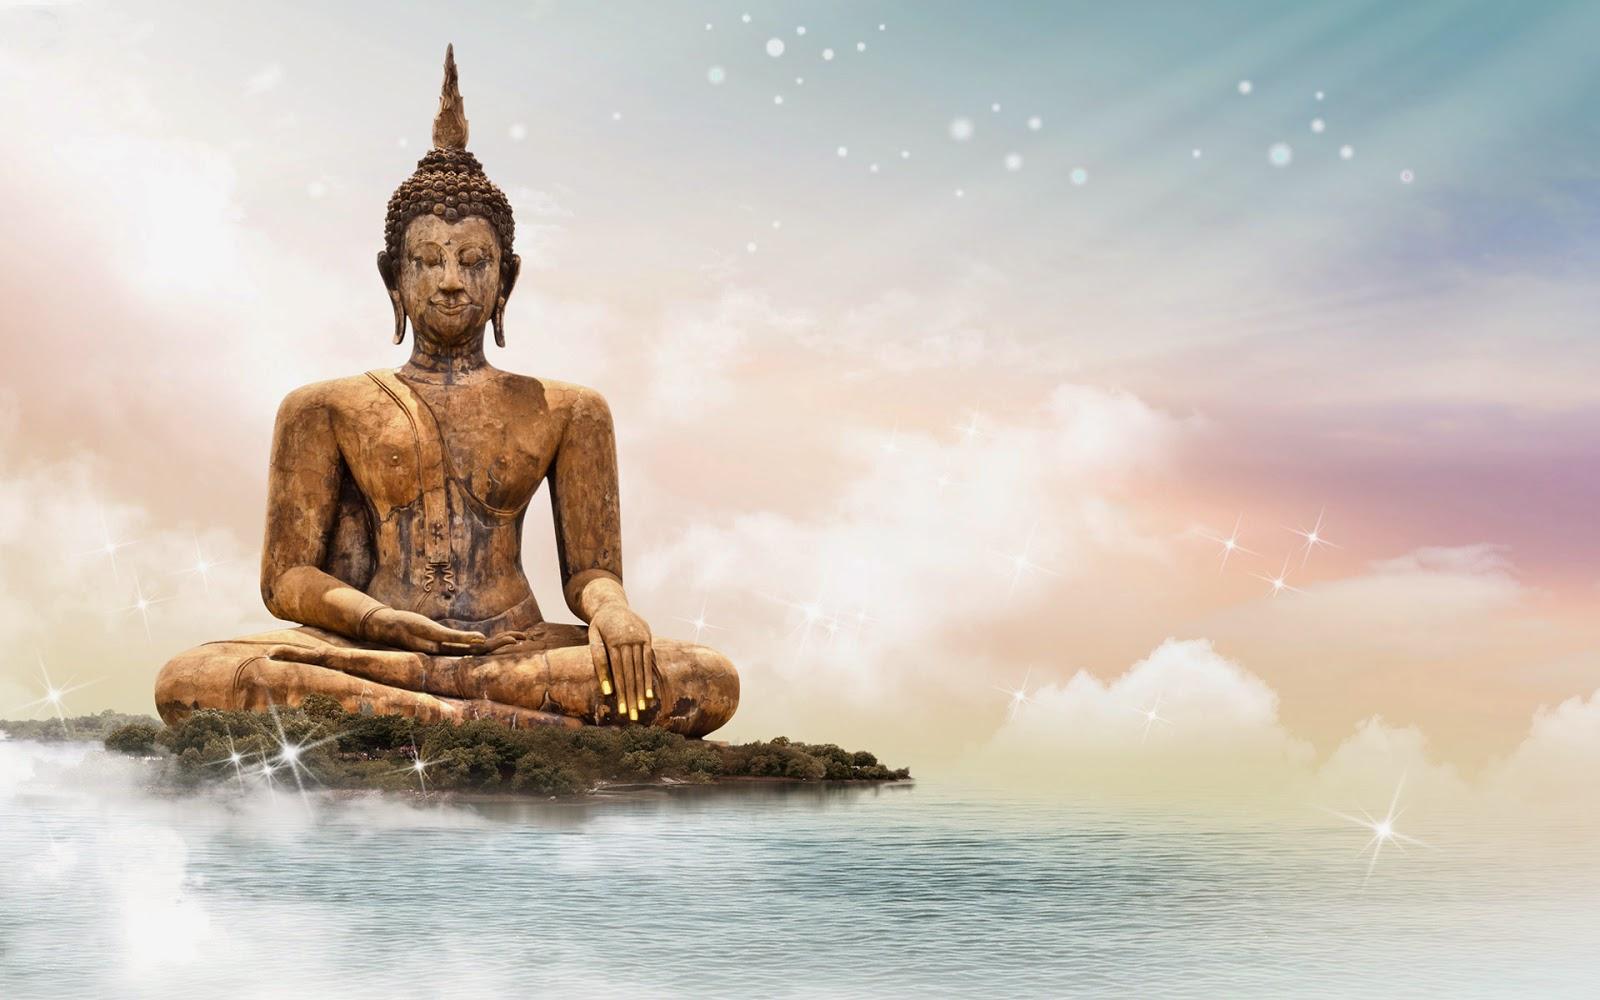 Buddha statue wallpaper wallpapersafari - Meditation art wallpaper ...